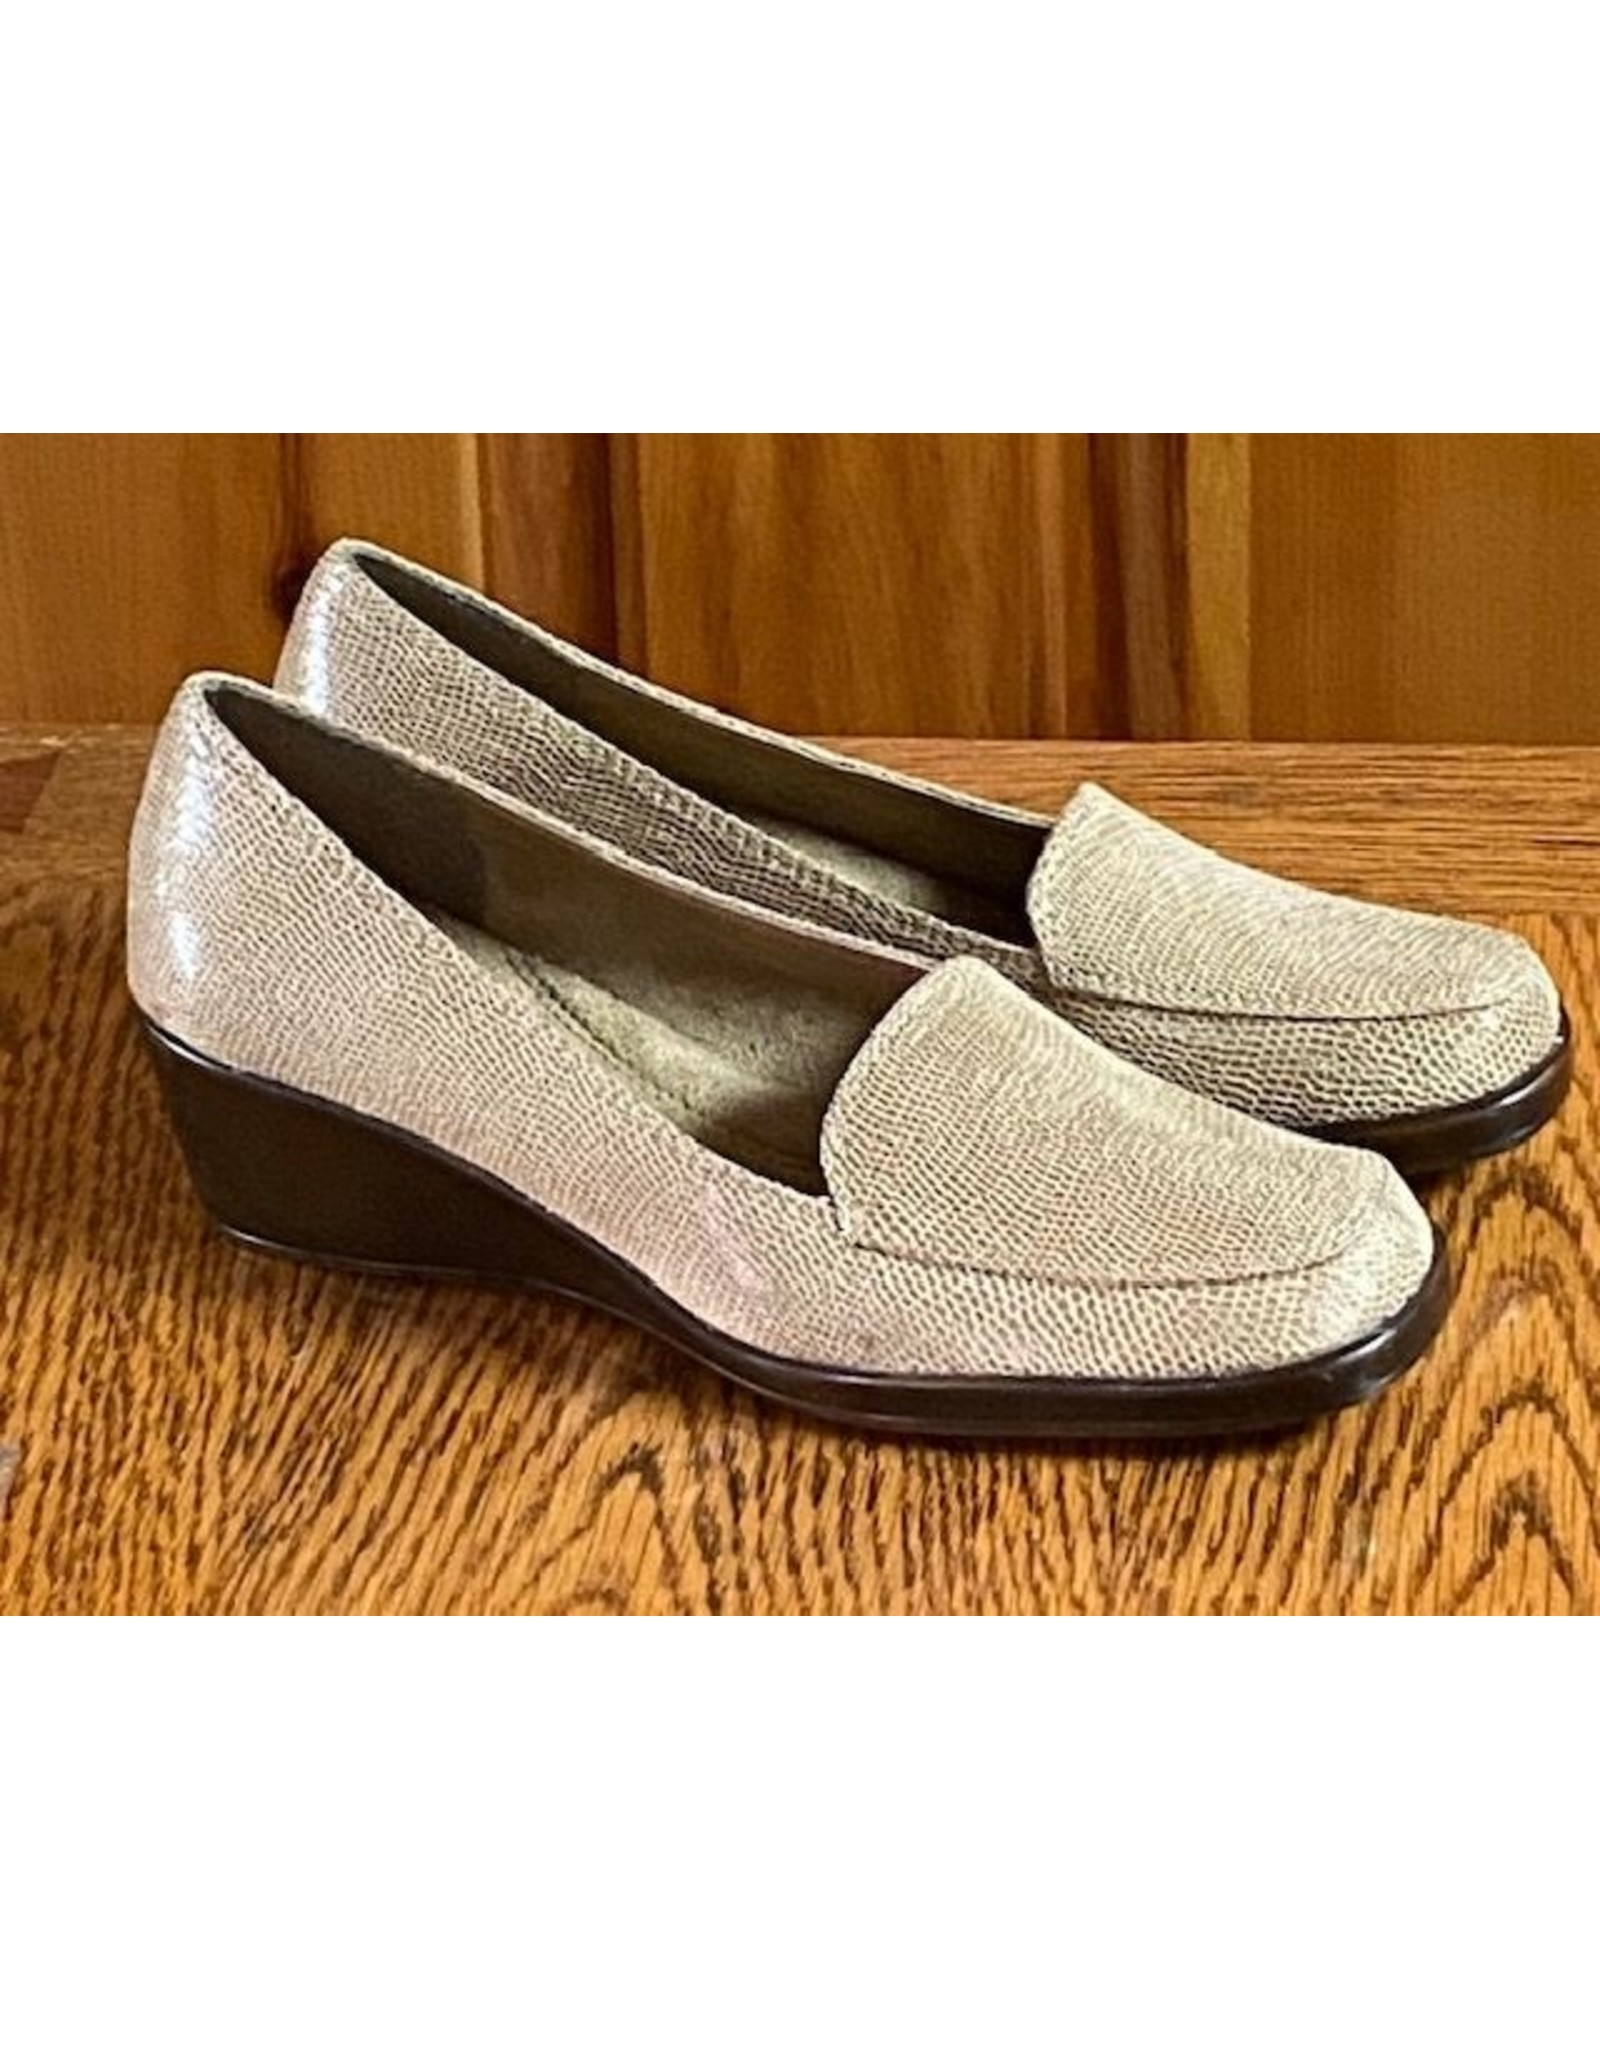 Aerosoles Low Wedge Shoe